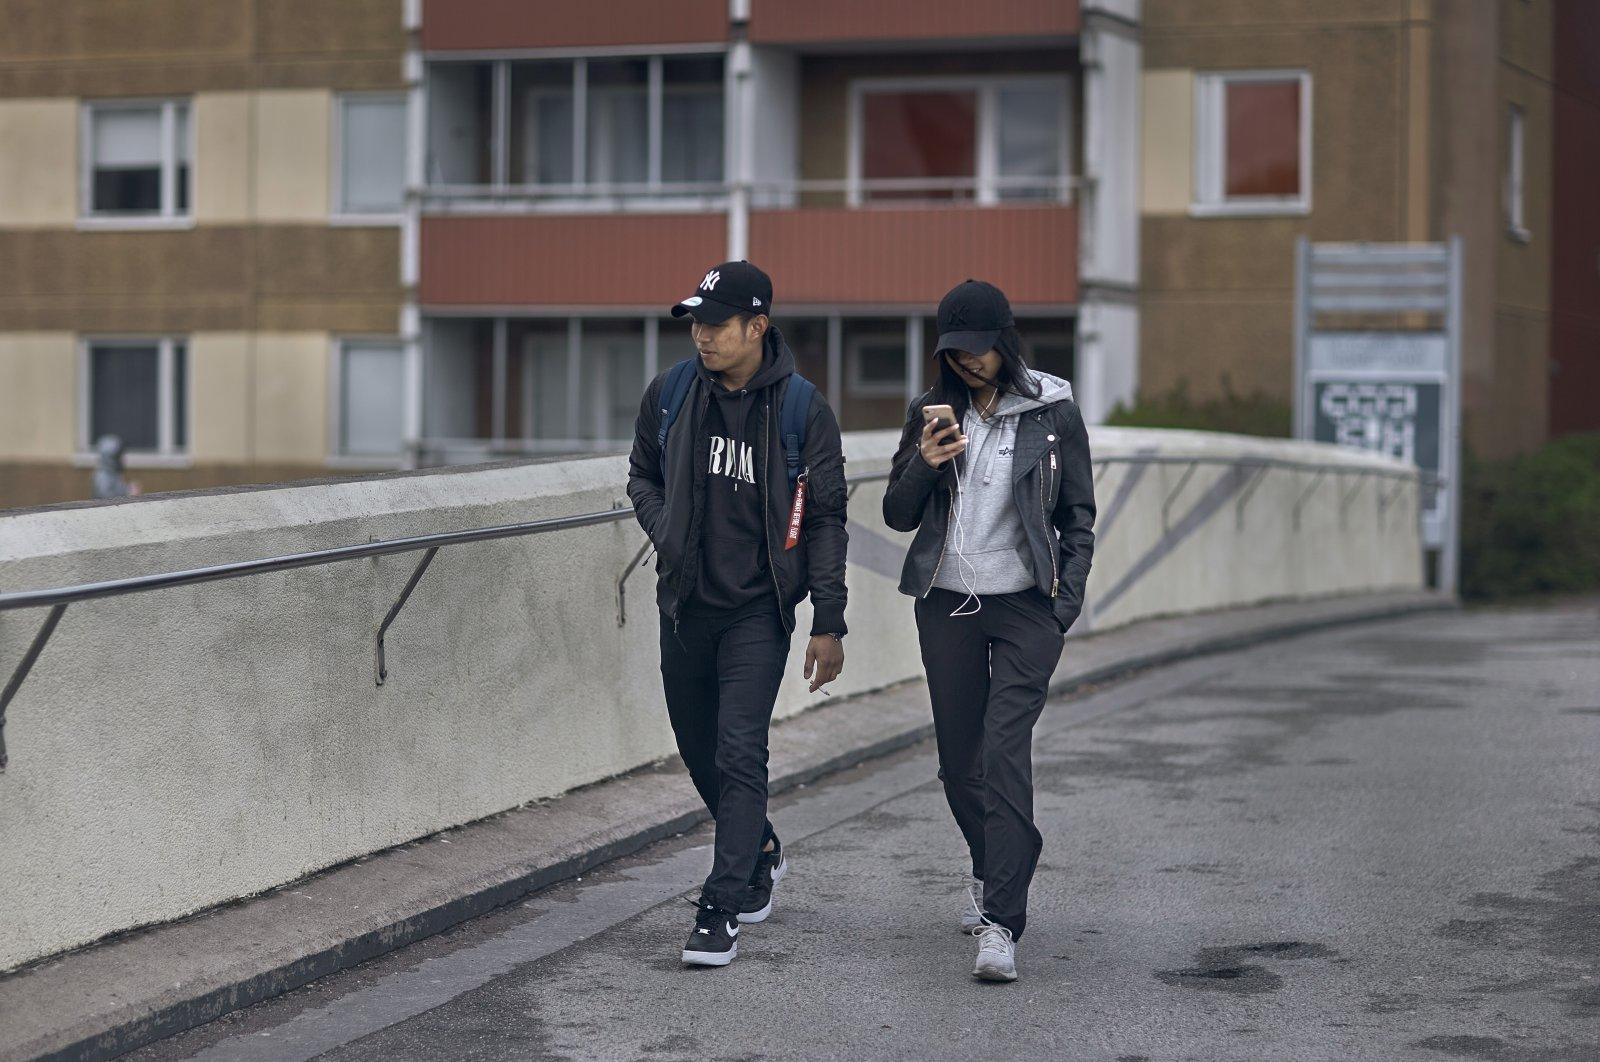 A young couple walks along a bridge in Rinkeby-Kista borough in Stockholm, Sweden, April 28, 2020. (AP Photo)